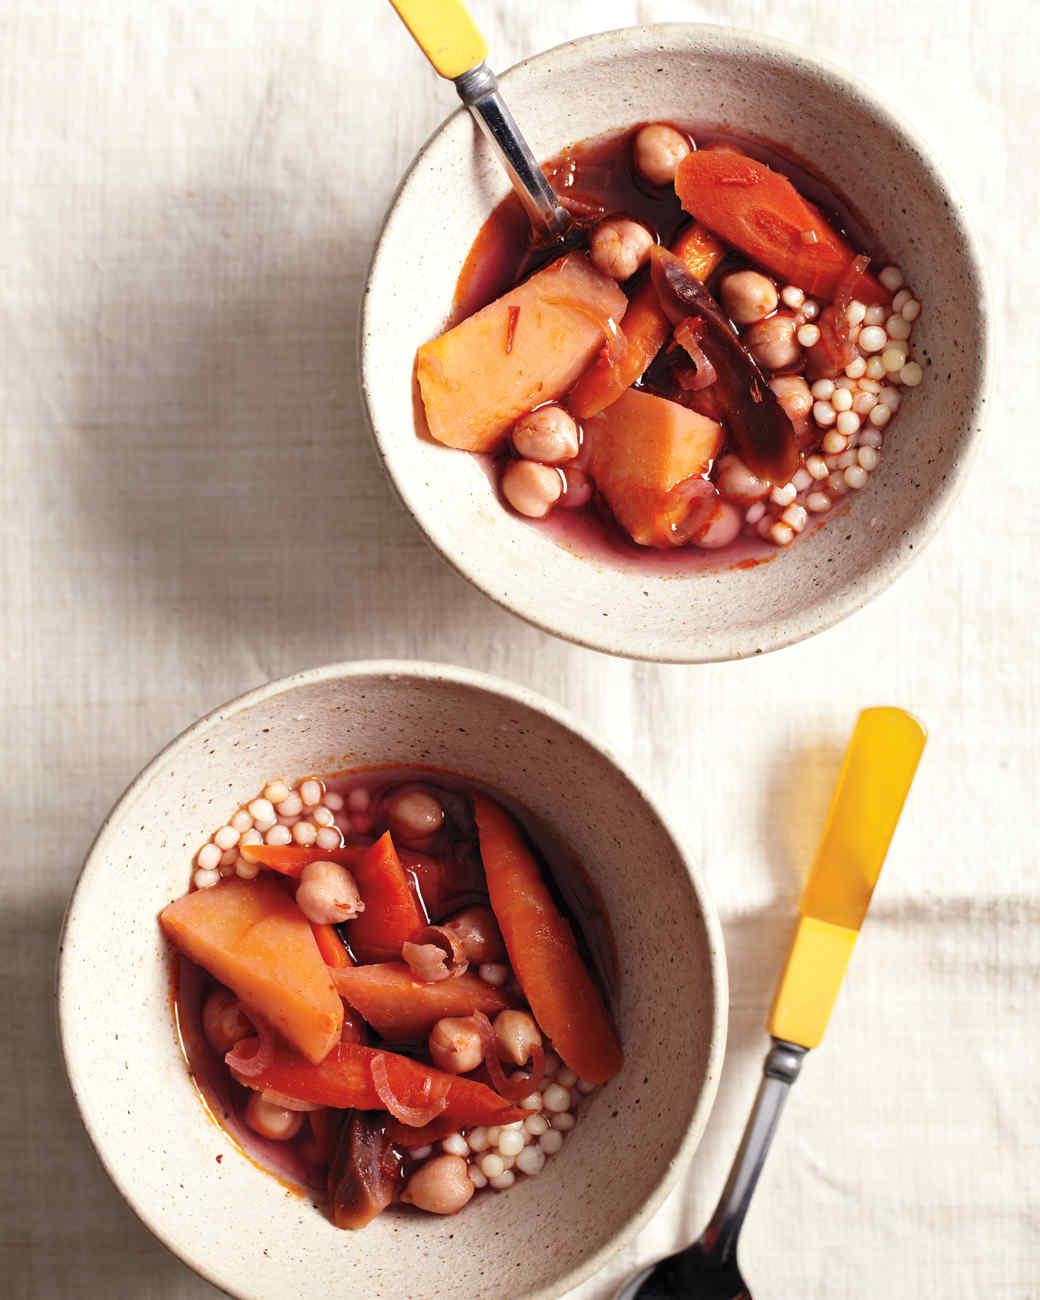 moroccan-soup-155-mld109436.jpg